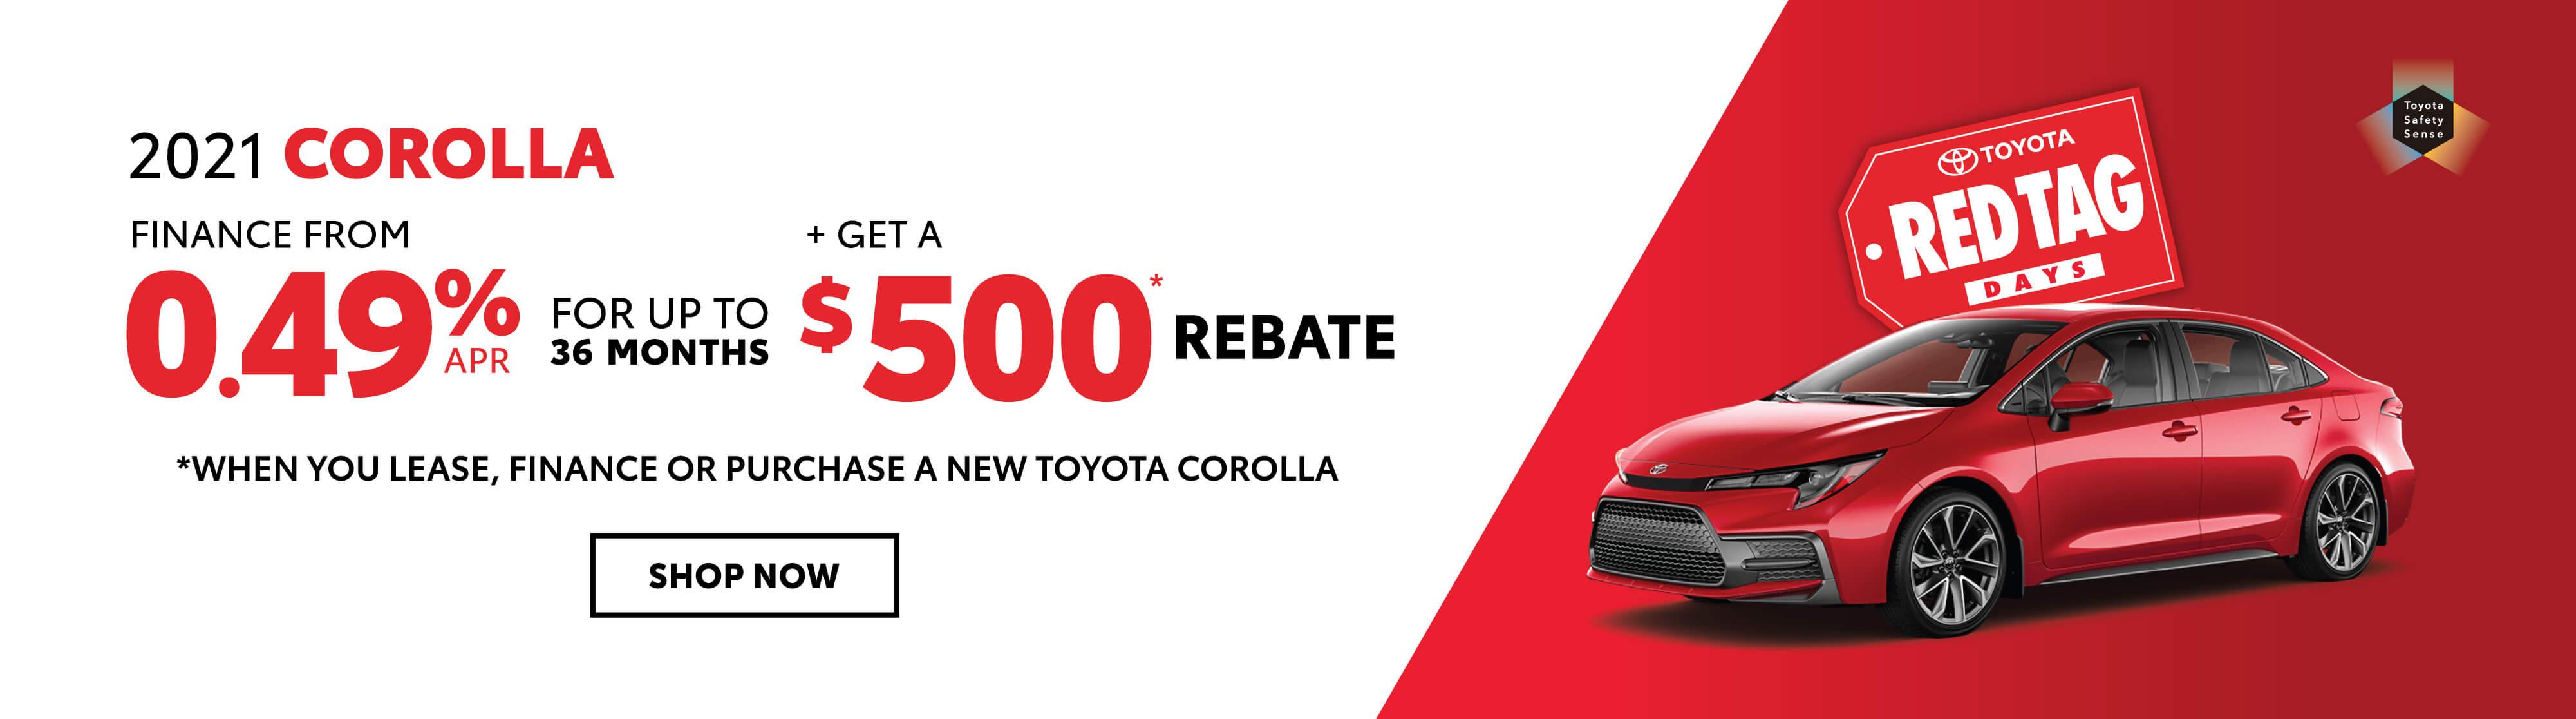 Toyota Corolla Offer Georgetown Toyota